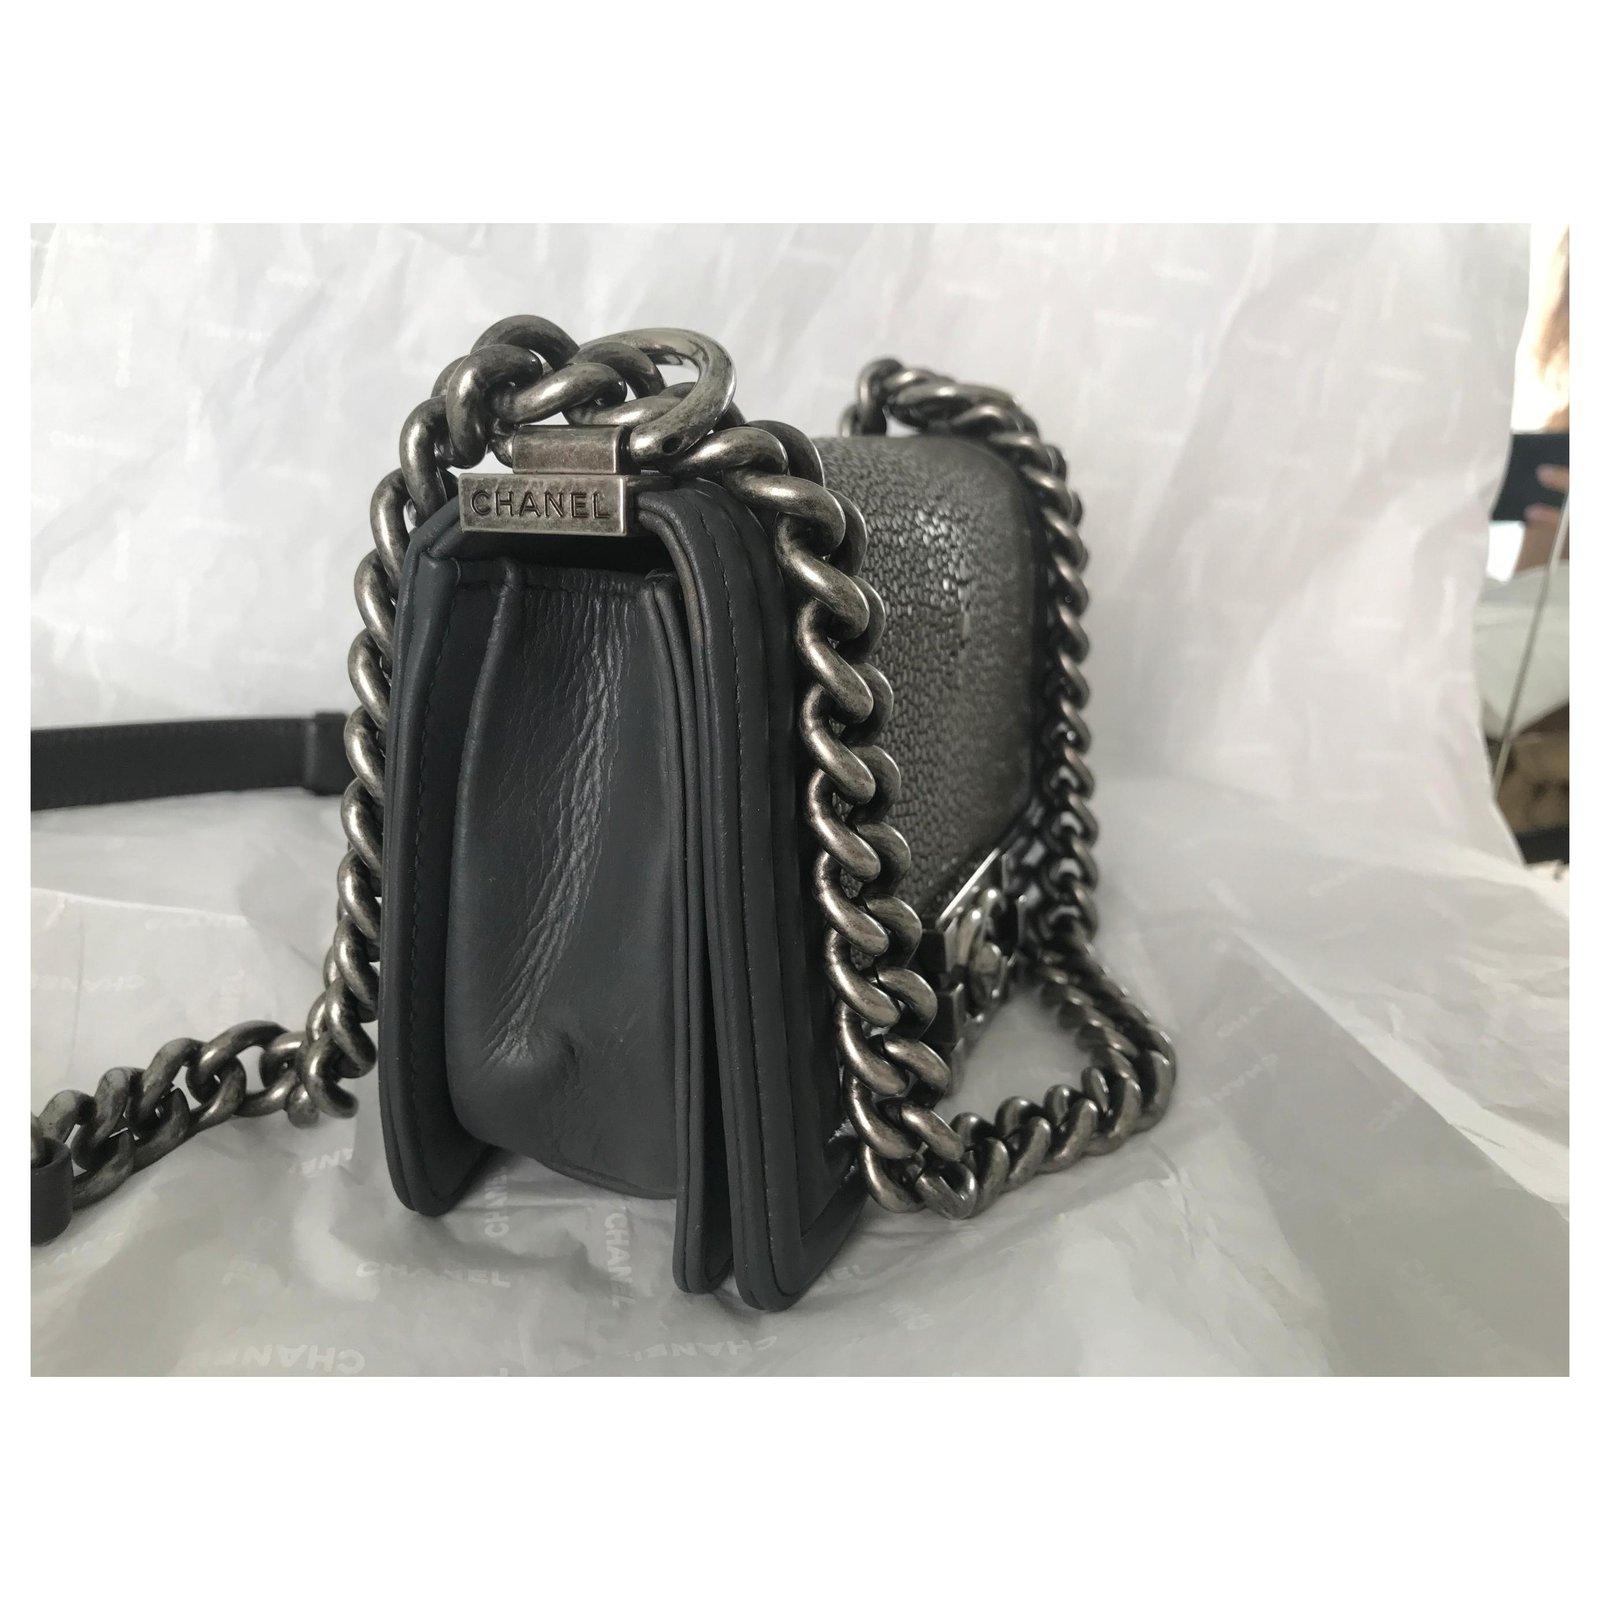 5cbd906421029f Chanel Stingray Boy Small Flap Bag Limited edition Handbags Leather,Exotic  leather Grey,Dark grey ref.120667 - Joli Closet